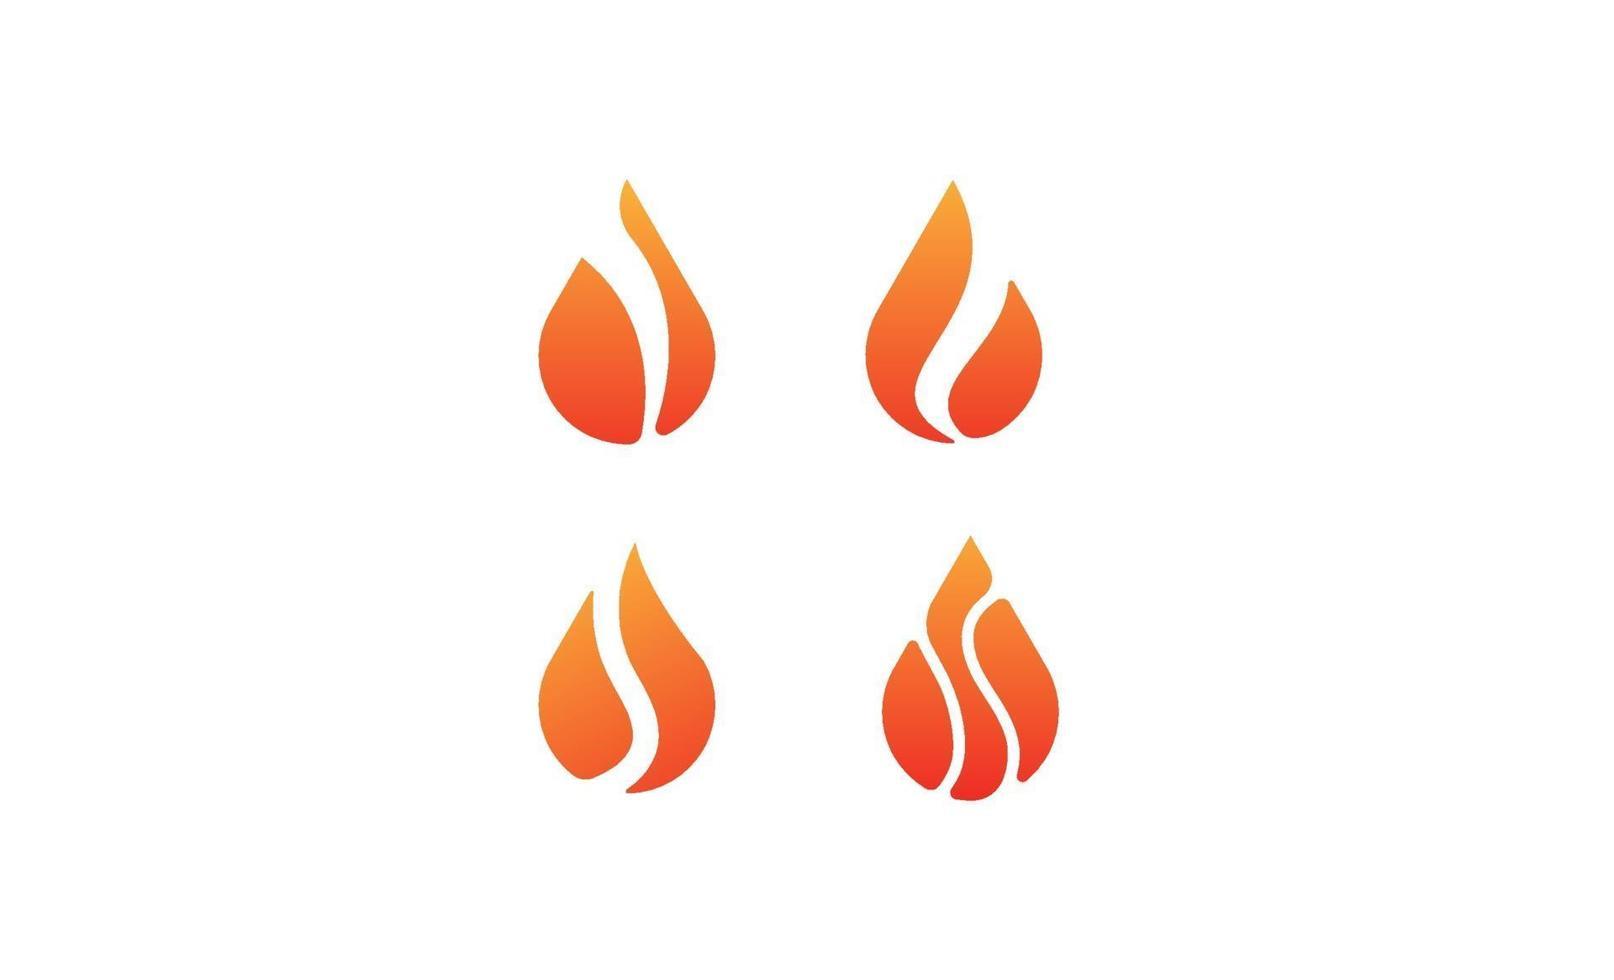 brand flamma logotyp set vektor mall illustration grafisk design